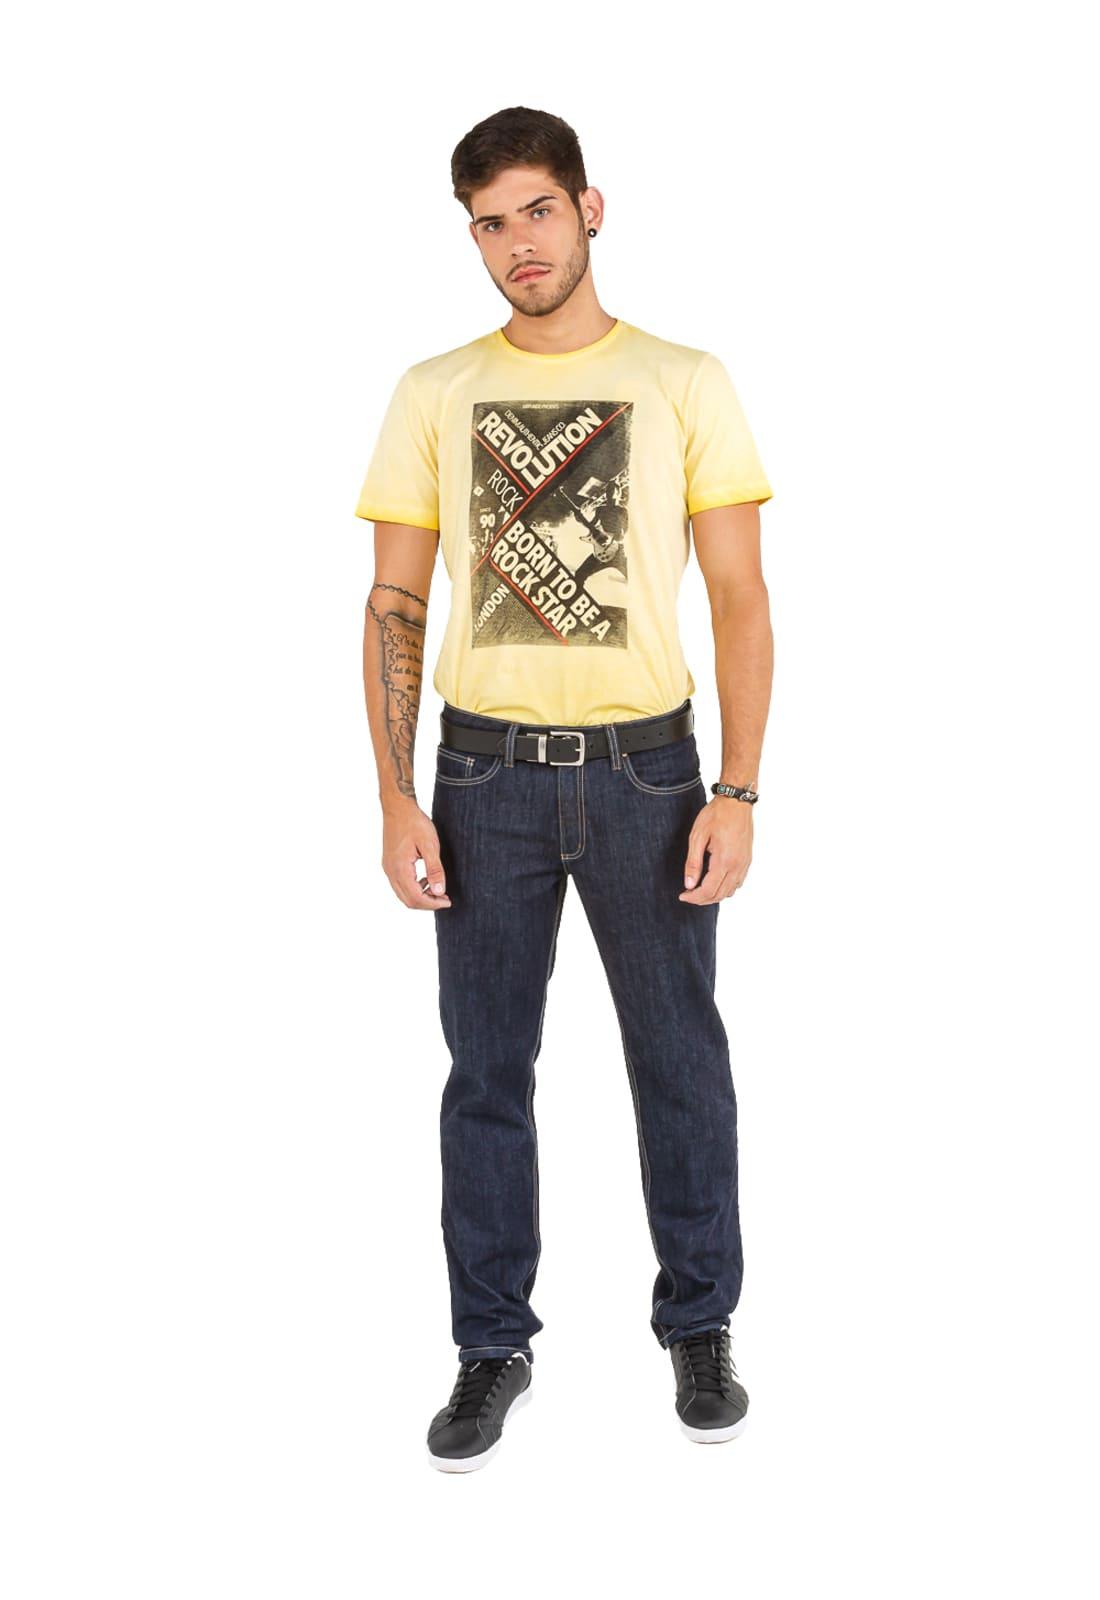 Calça Jeans Reta Masculina Latifundio Amaciada